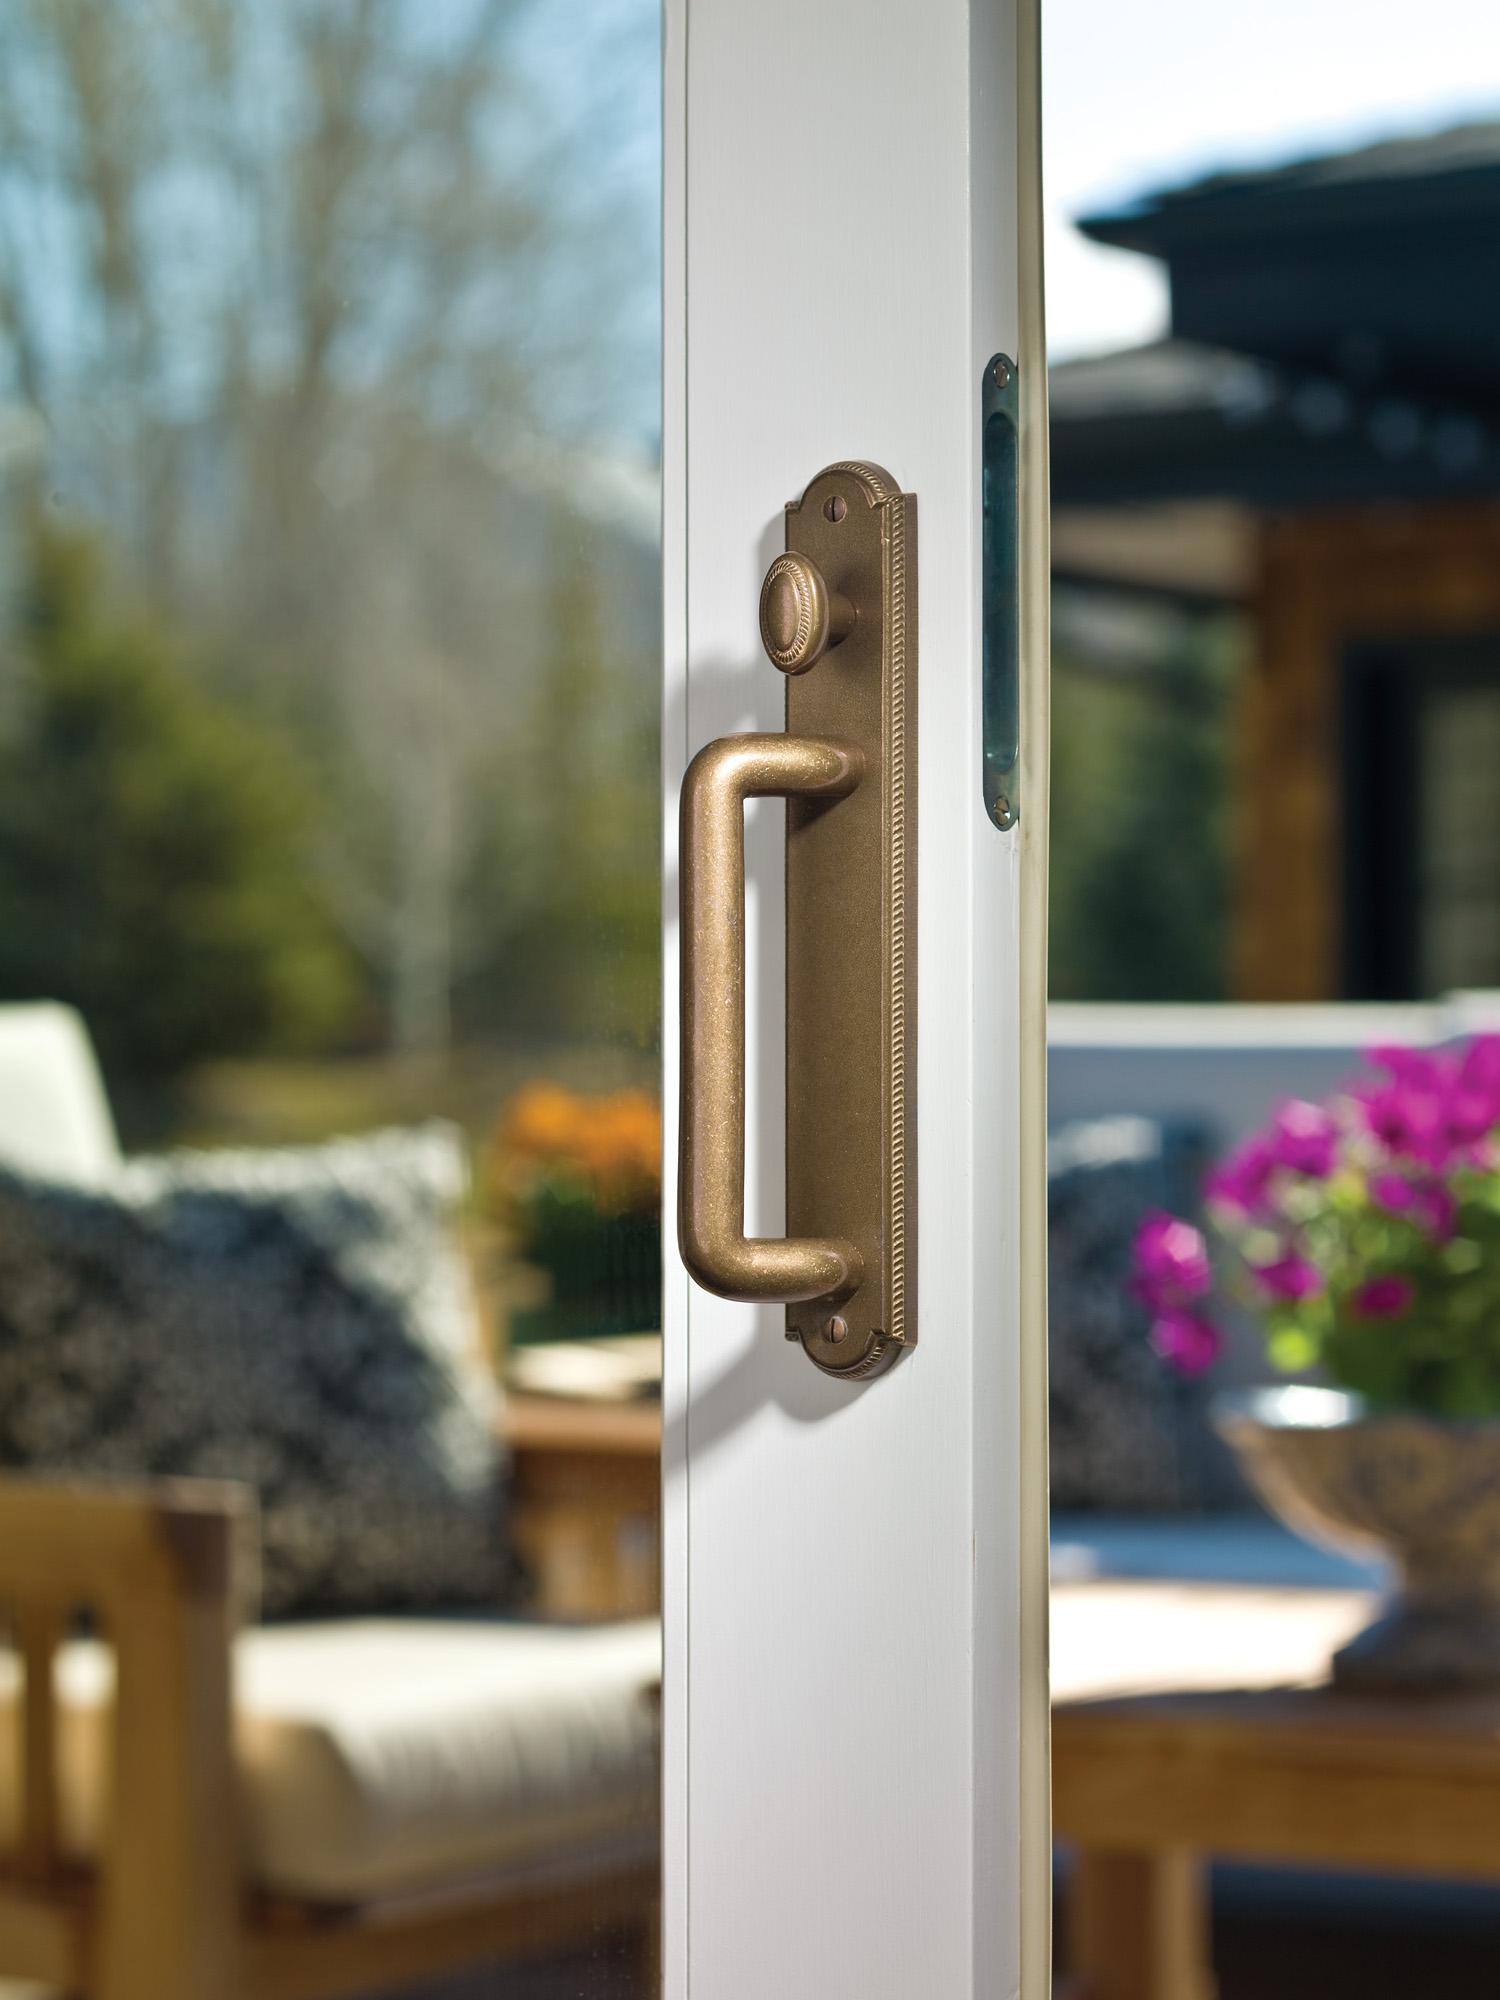 WINDOWS & DOORS   Interior & Exterior Solid, Semi-Solid & Hollow Core Steel & Fiberglass Residential & Commercial __________ AAW CGI Jeld-Wen PGT Plaza Doors SuperGuard Trendex